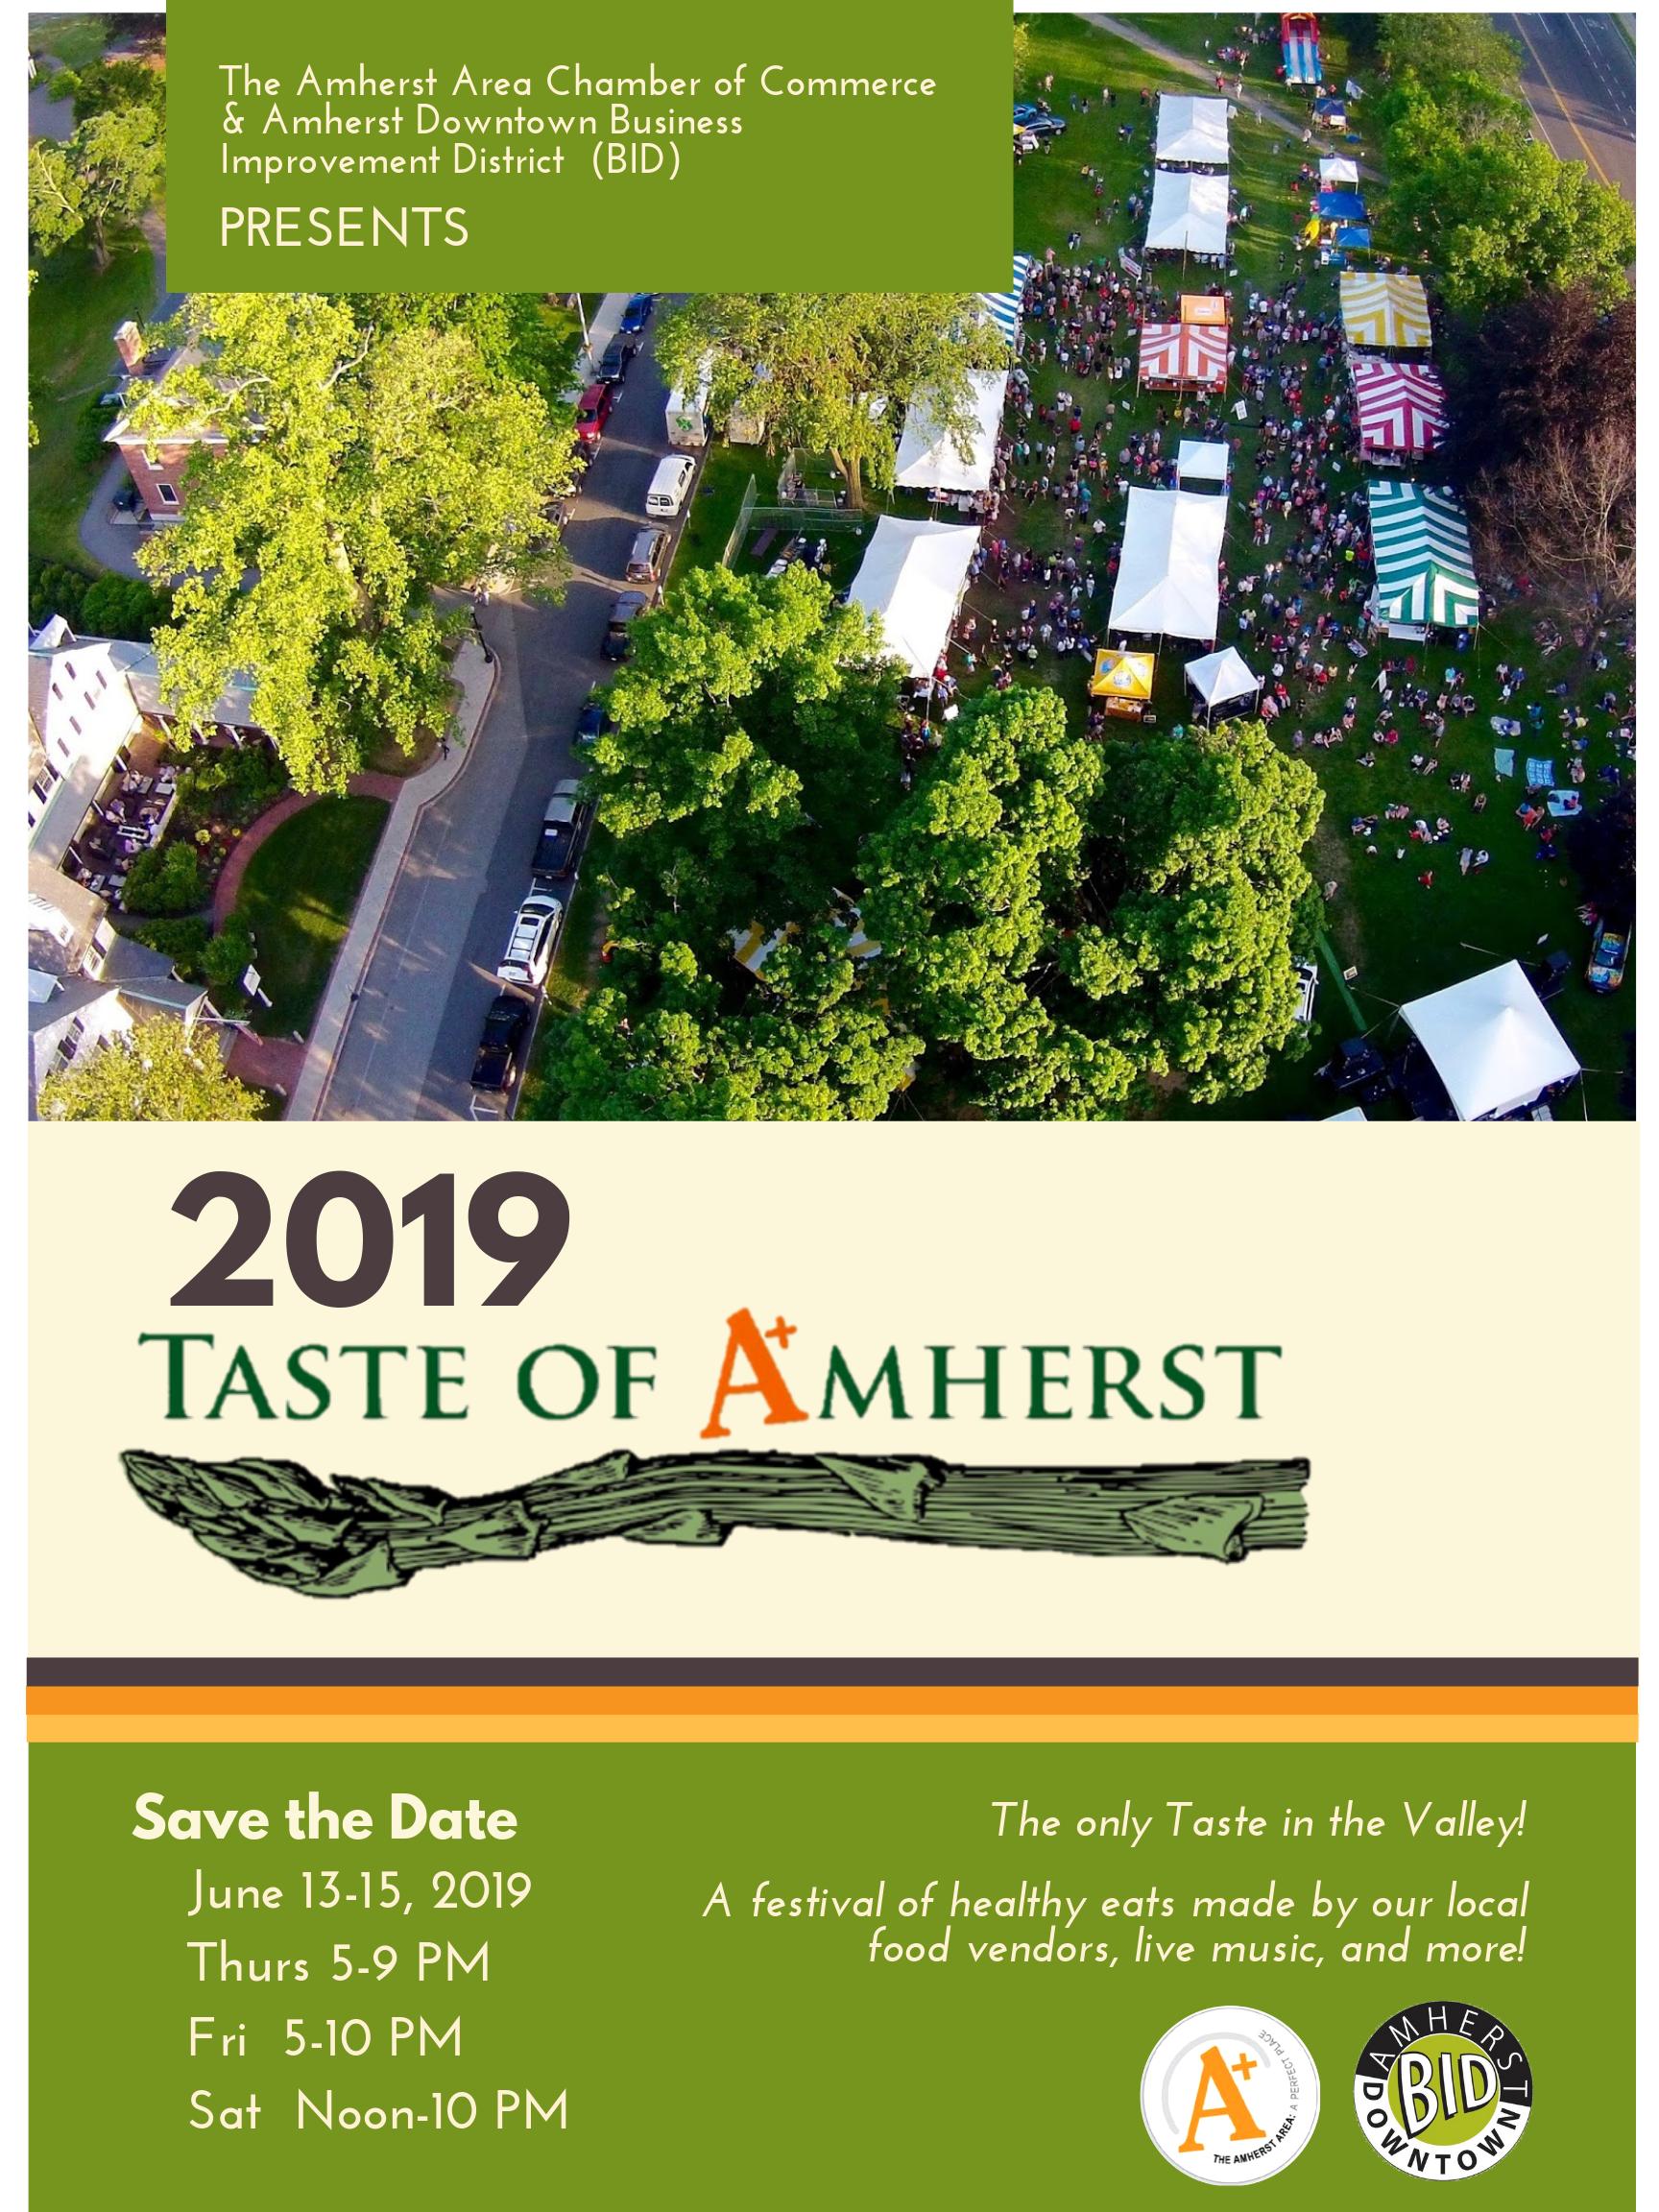 Taste-of-Amherst-Poster-(1).png